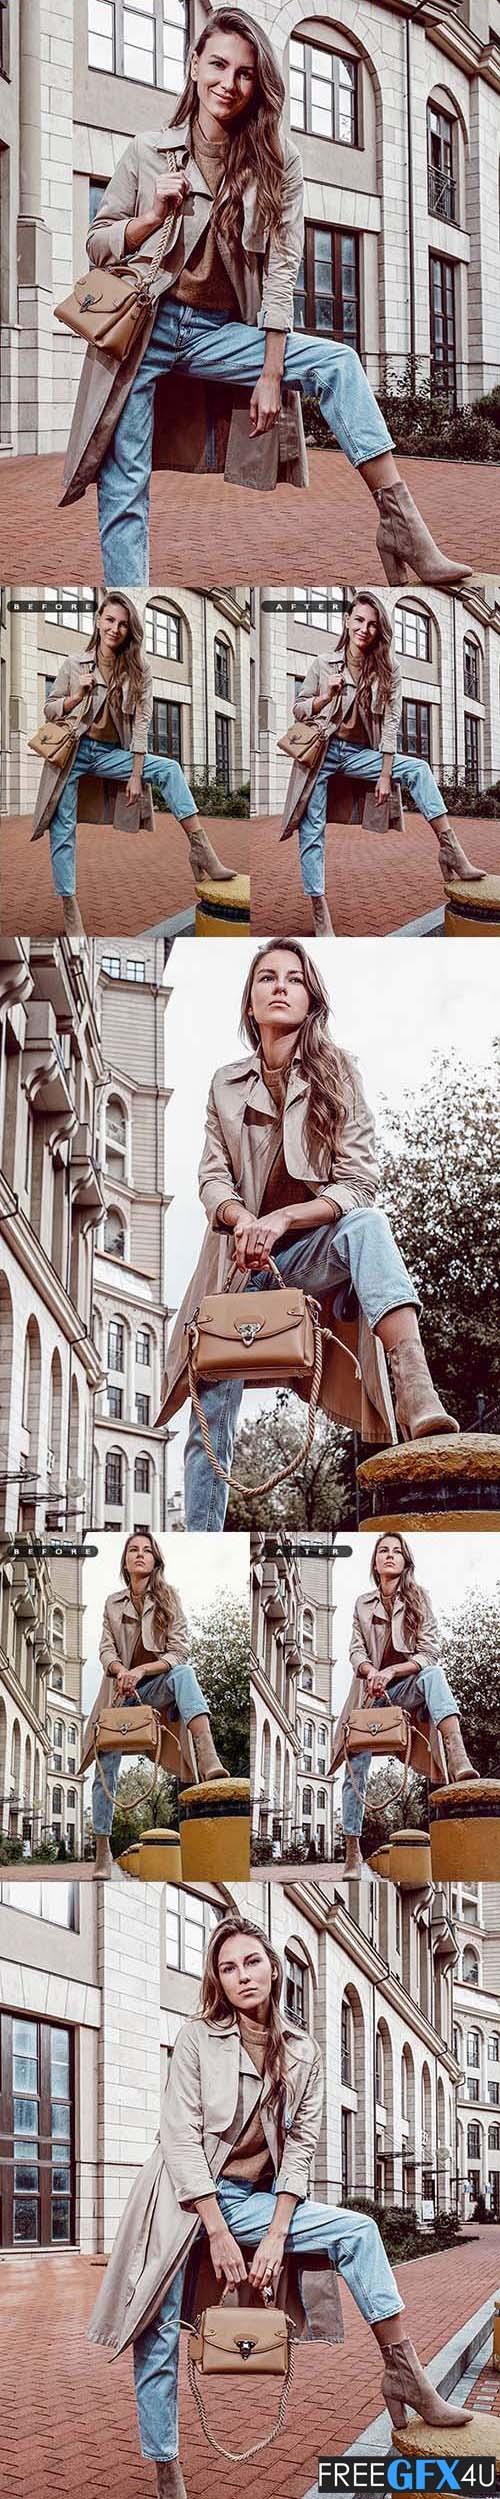 Street Fashion Photoshop Action